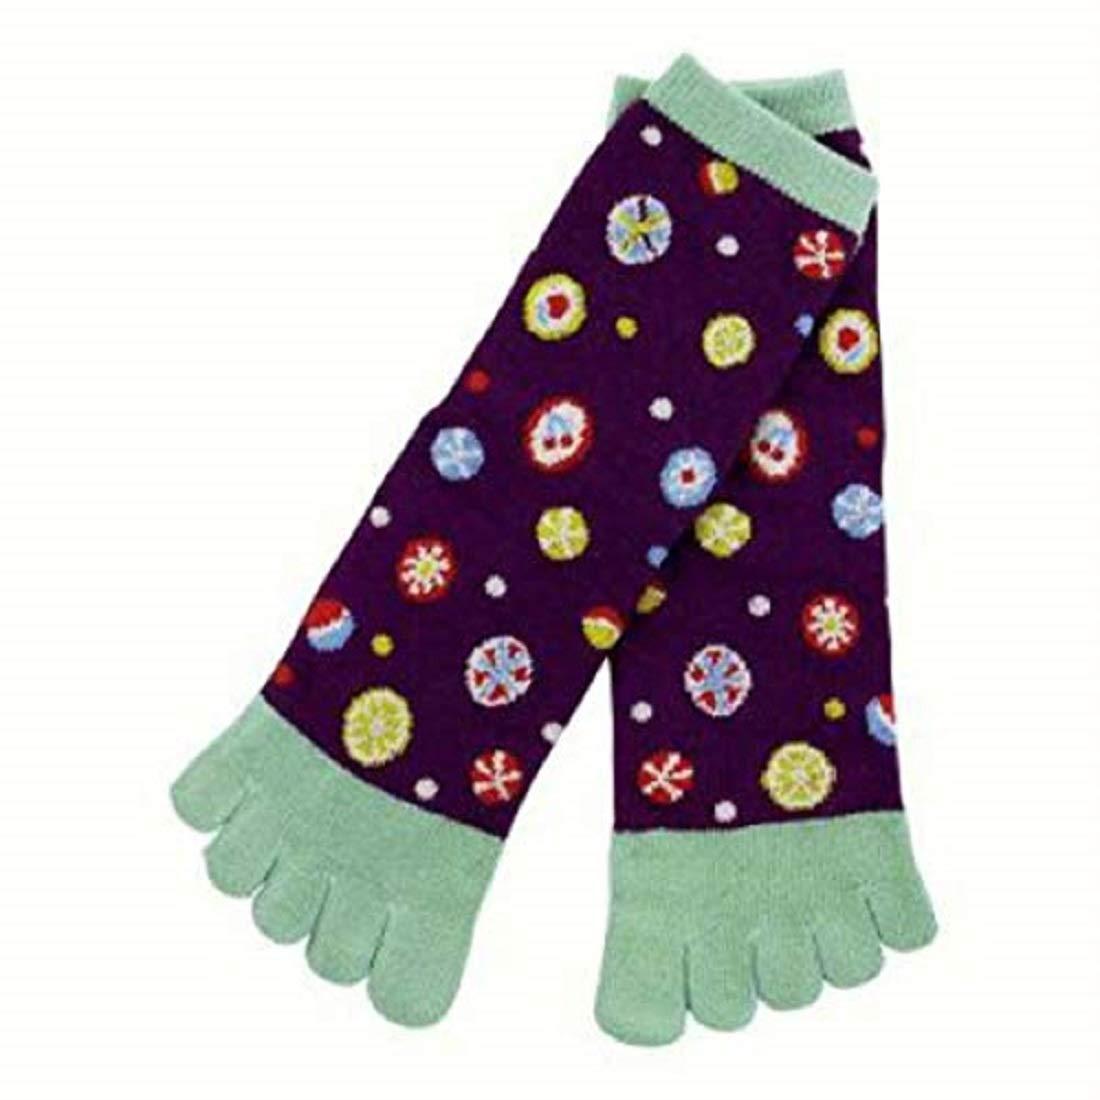 Japan Ninja 5toe Socks 31304746 Candy Assort Kyoto Kurochiku ...